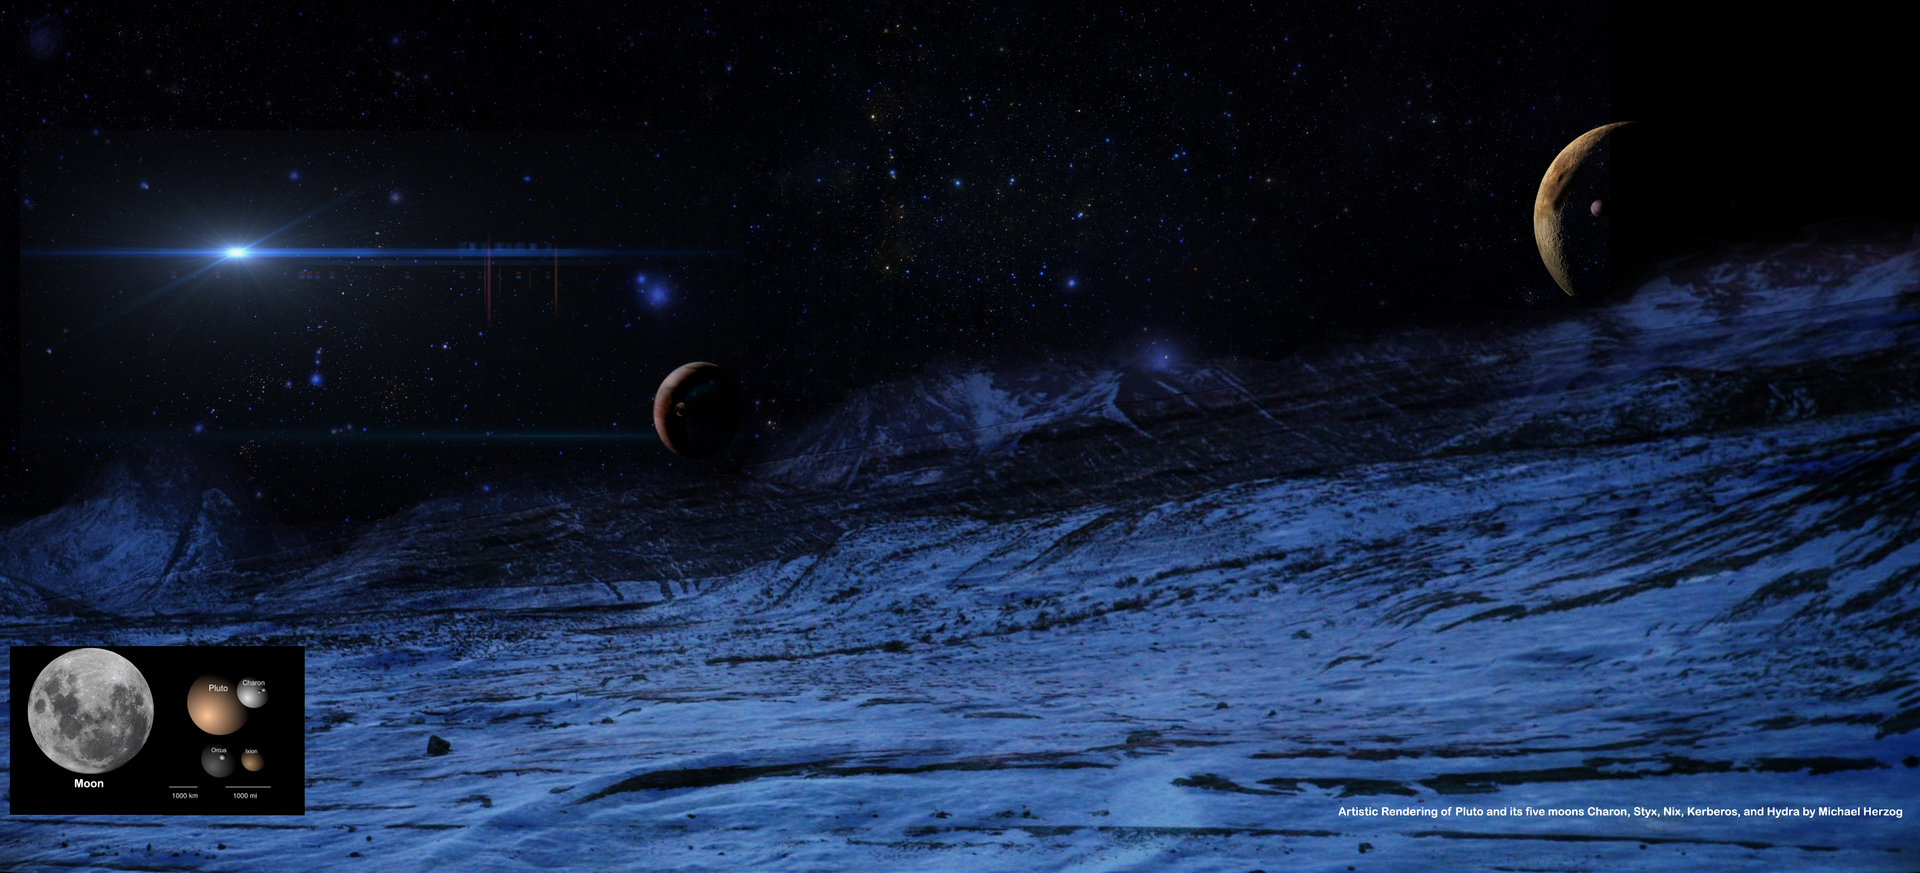 Kerberos Moon Of Plluto: Pluto And Its Five Moons